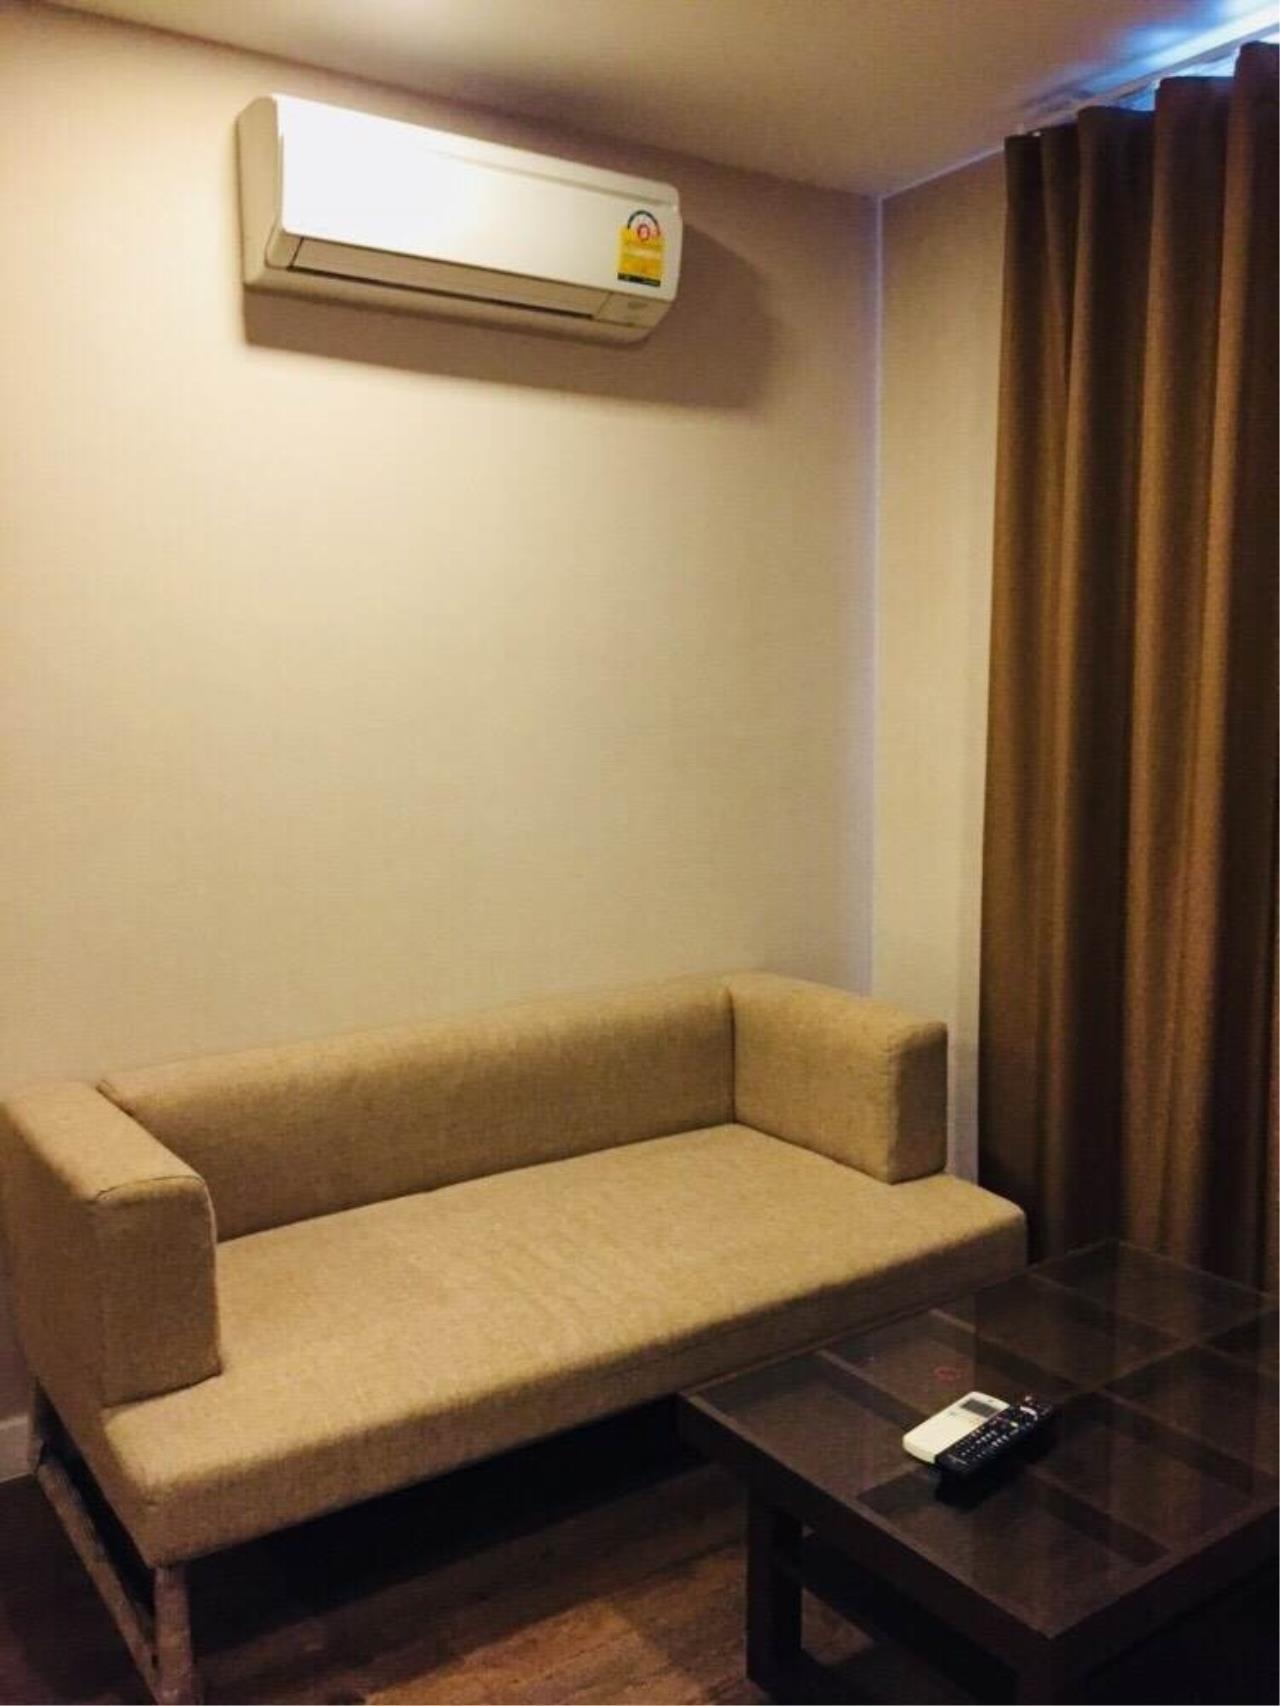 Uptown Assets  Agency's For Rent Esta Bliss Ramindra Building C  5 Floor Unit 126/550 2